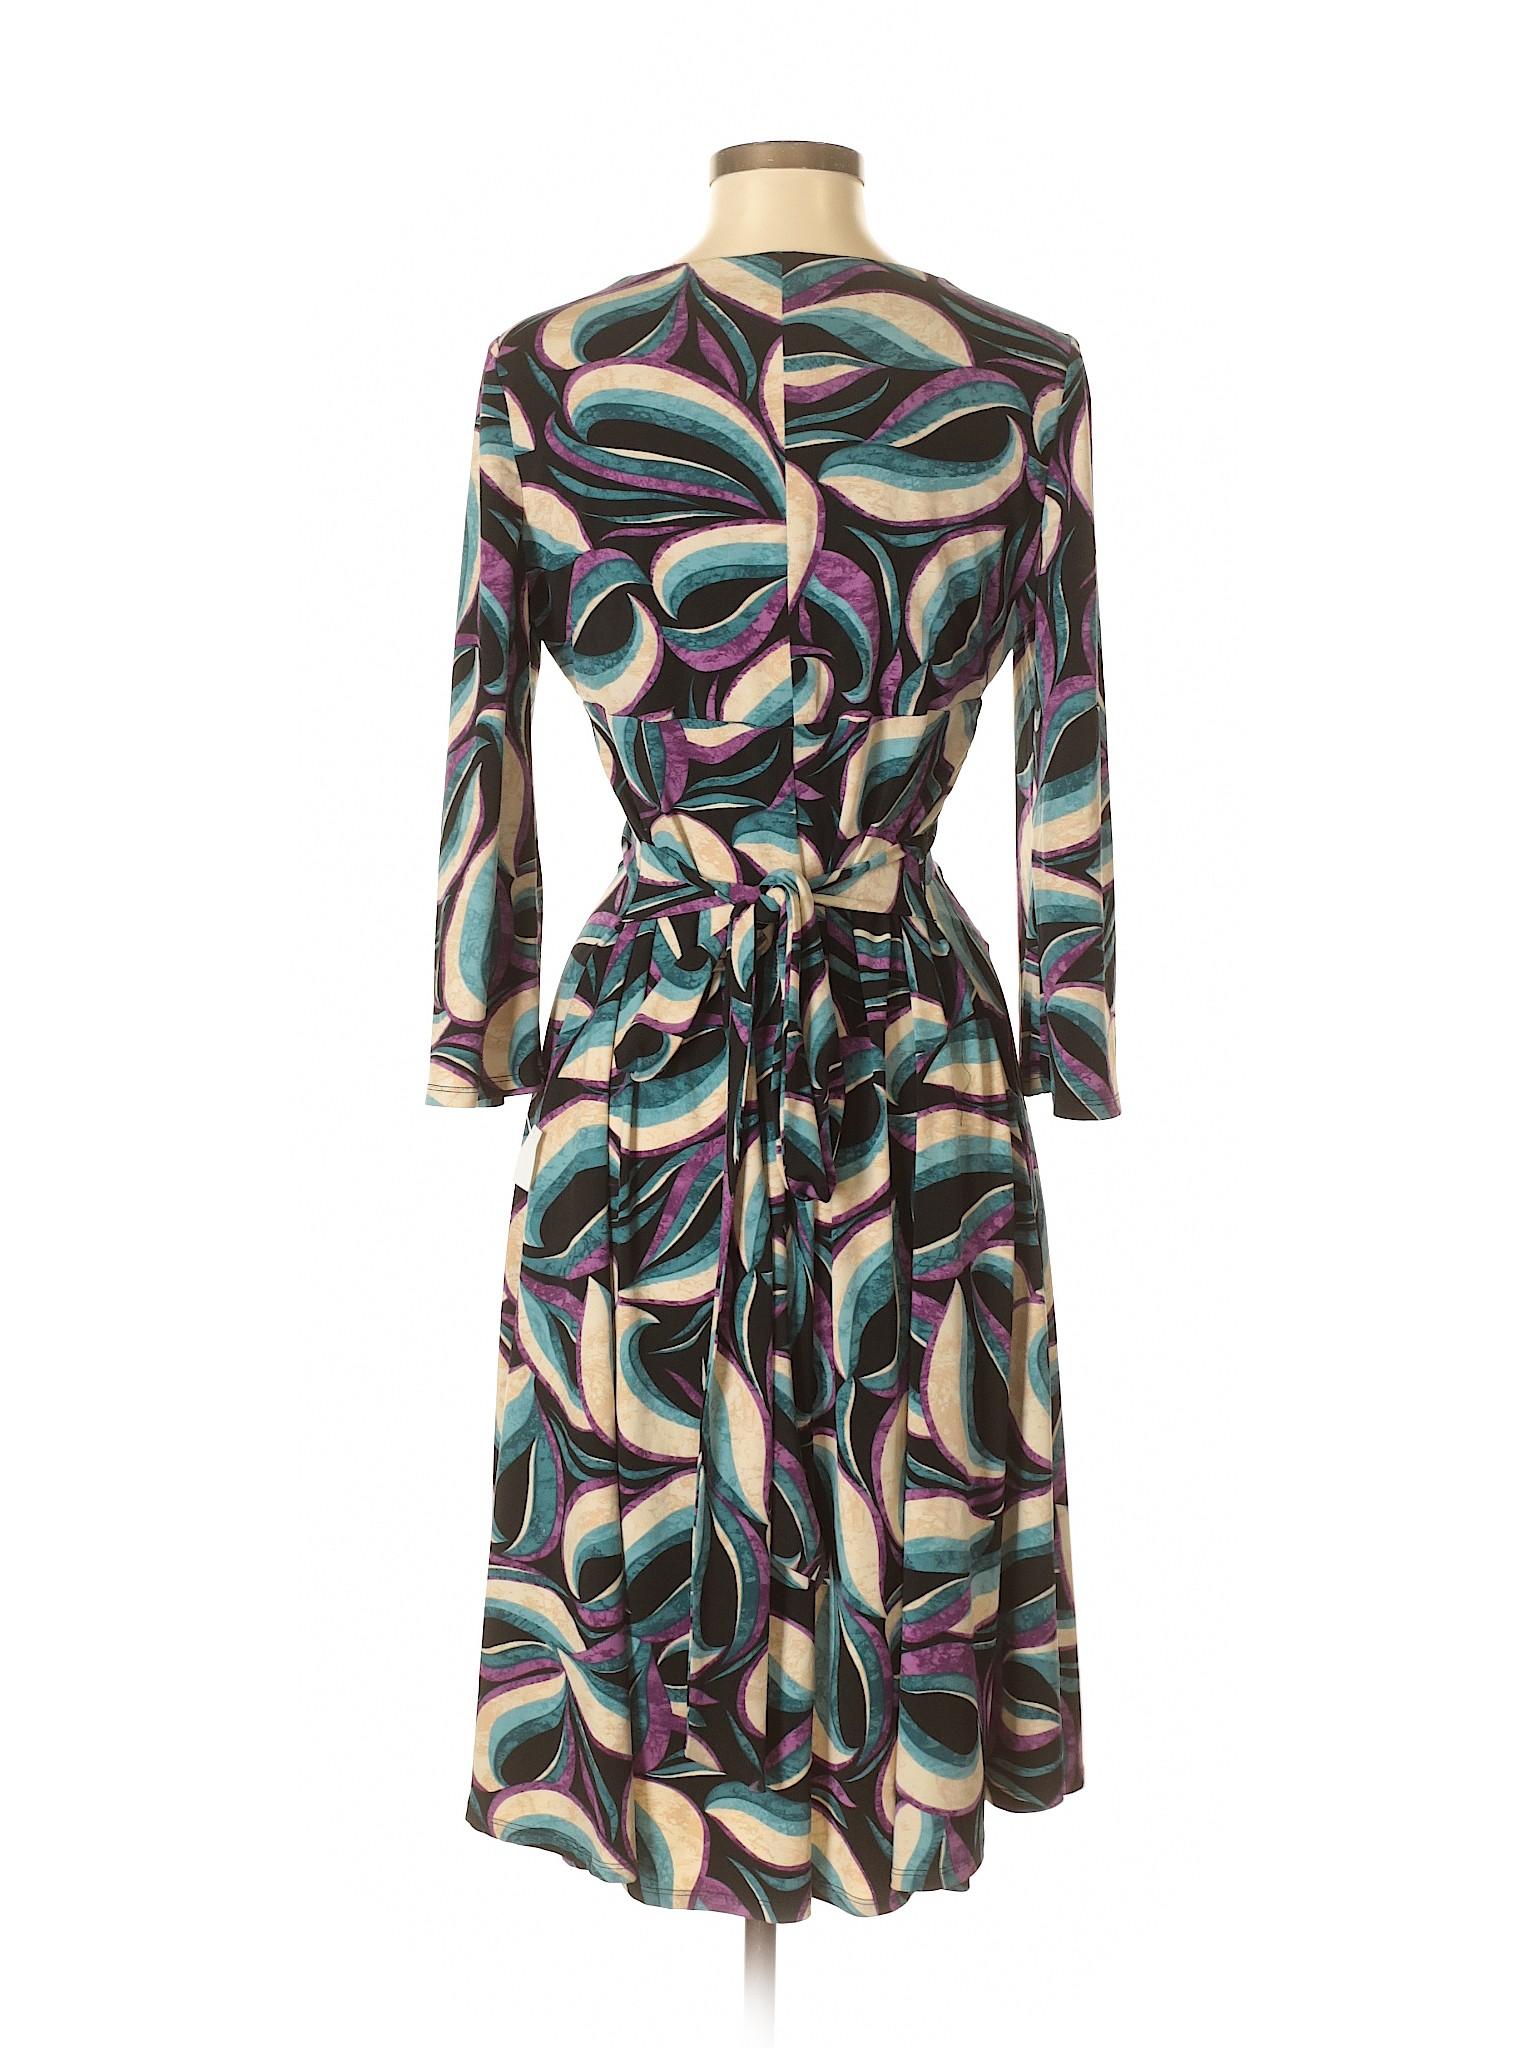 Selling Evan Picone Selling Dress Evan Casual xzfqdYnz8R